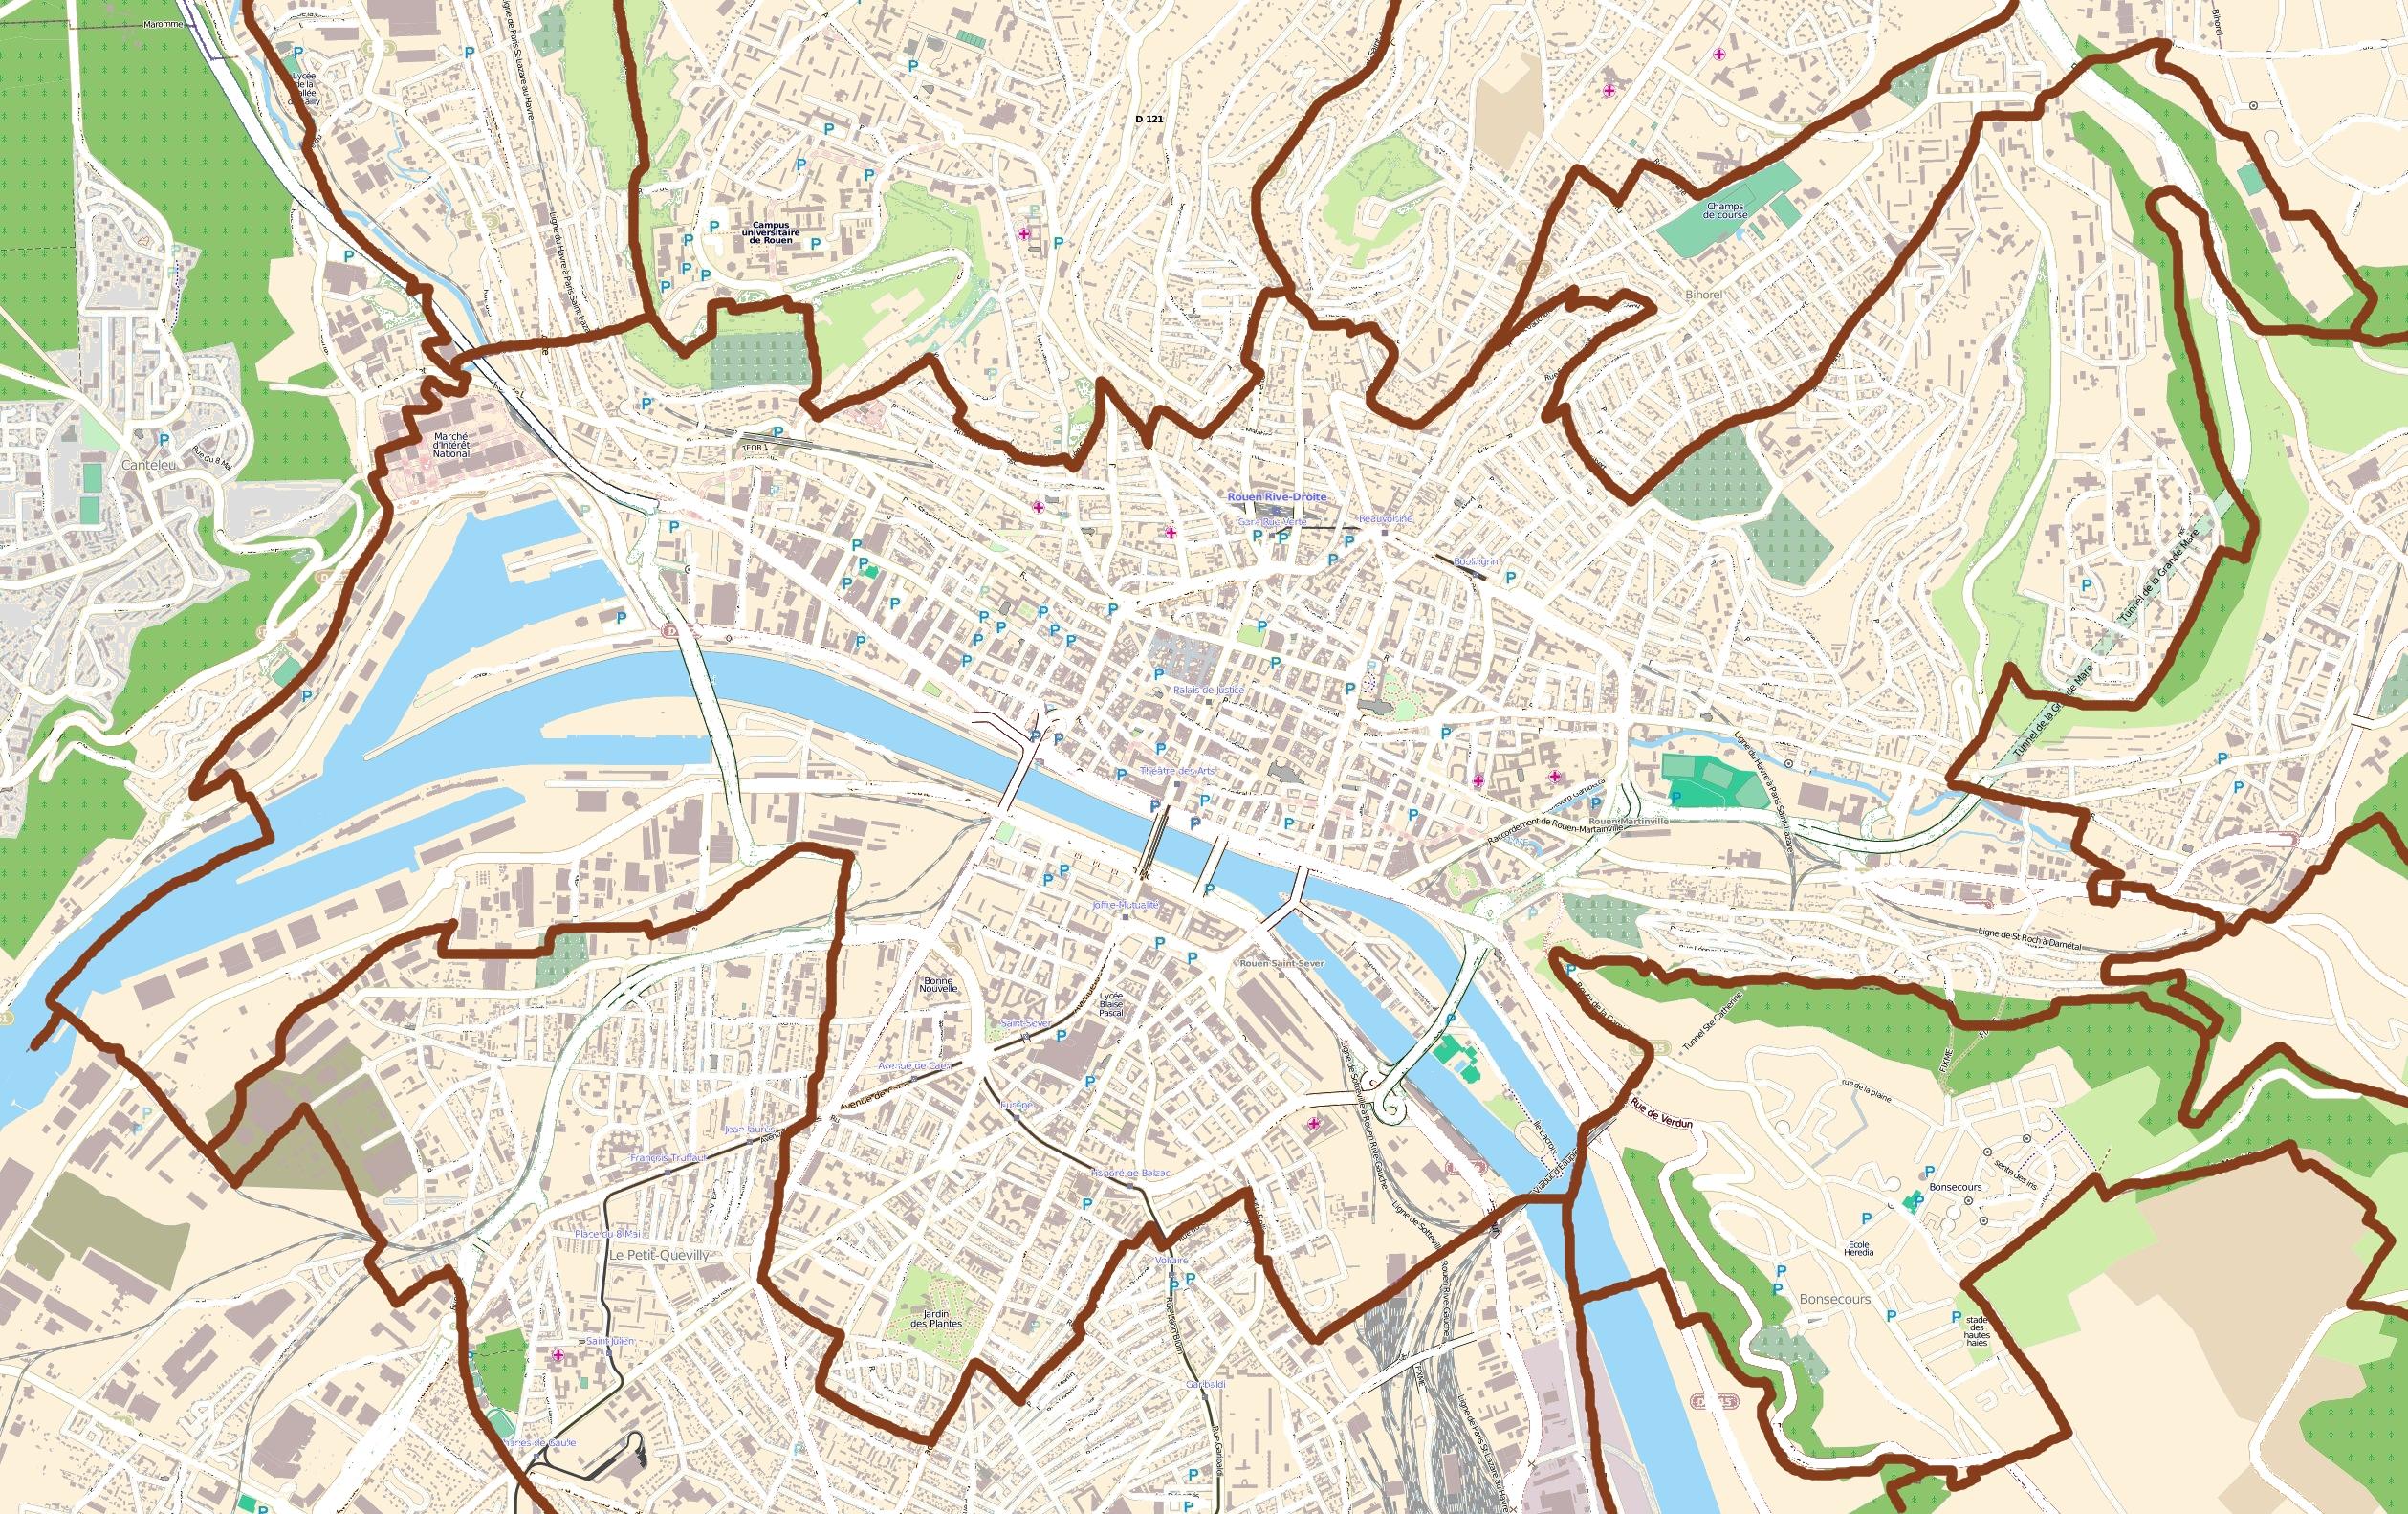 File:Map Rouen.jpg - Wikimedia Commons